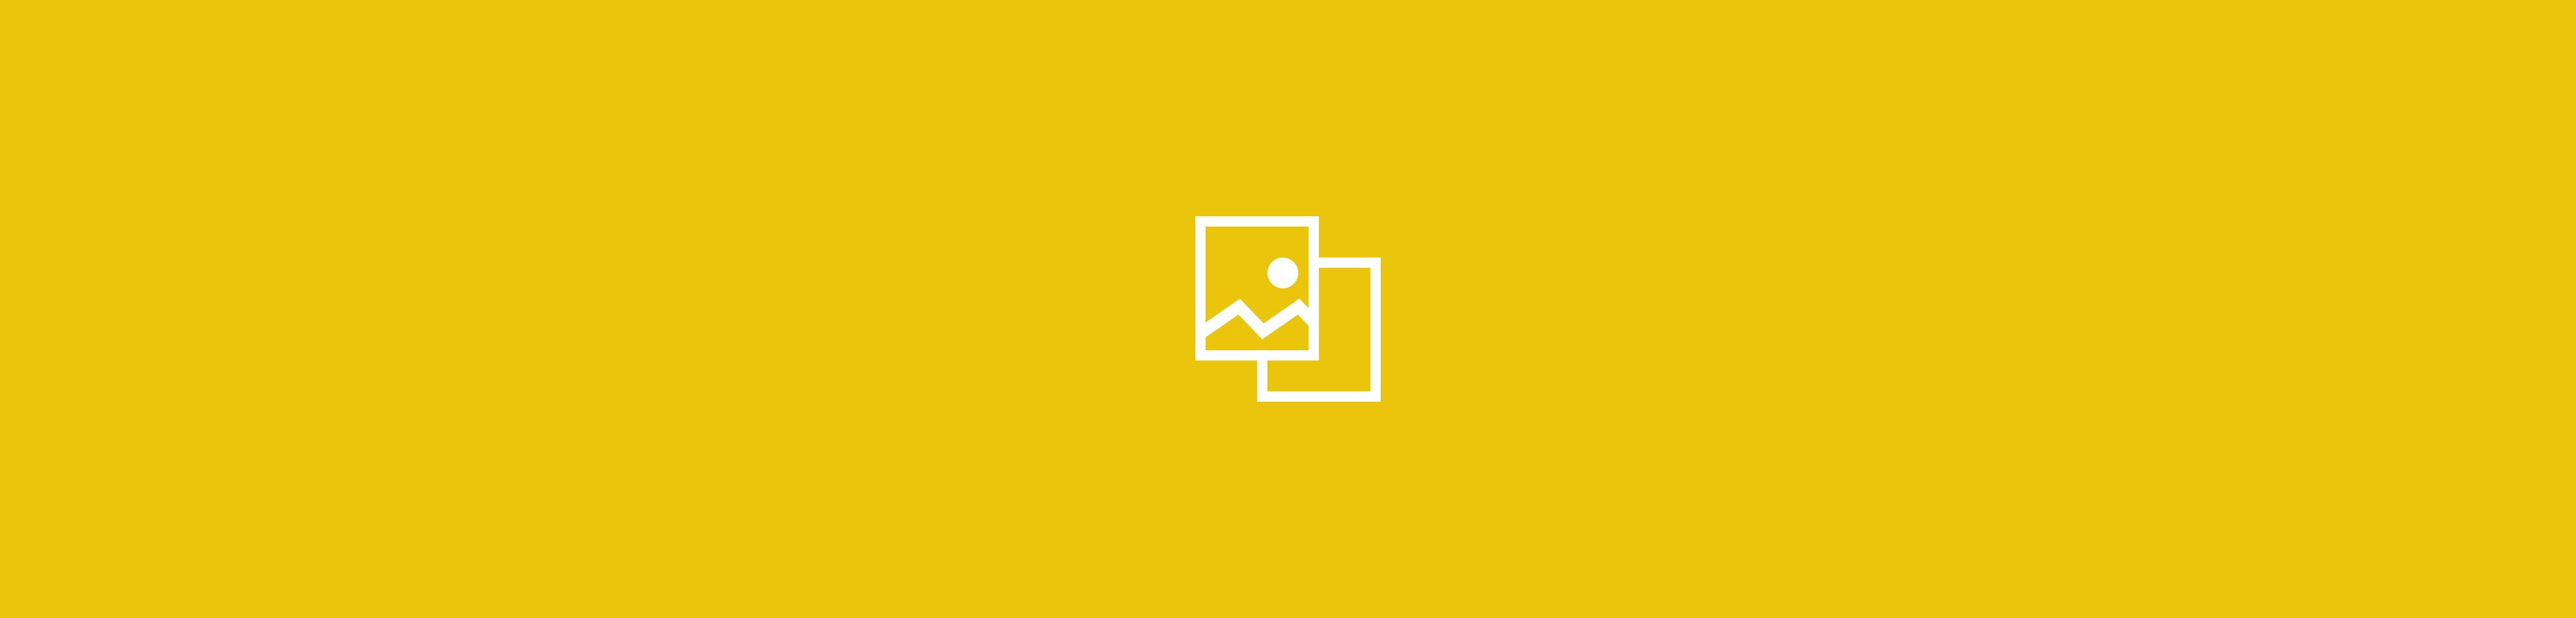 bmp to pdf converter free online